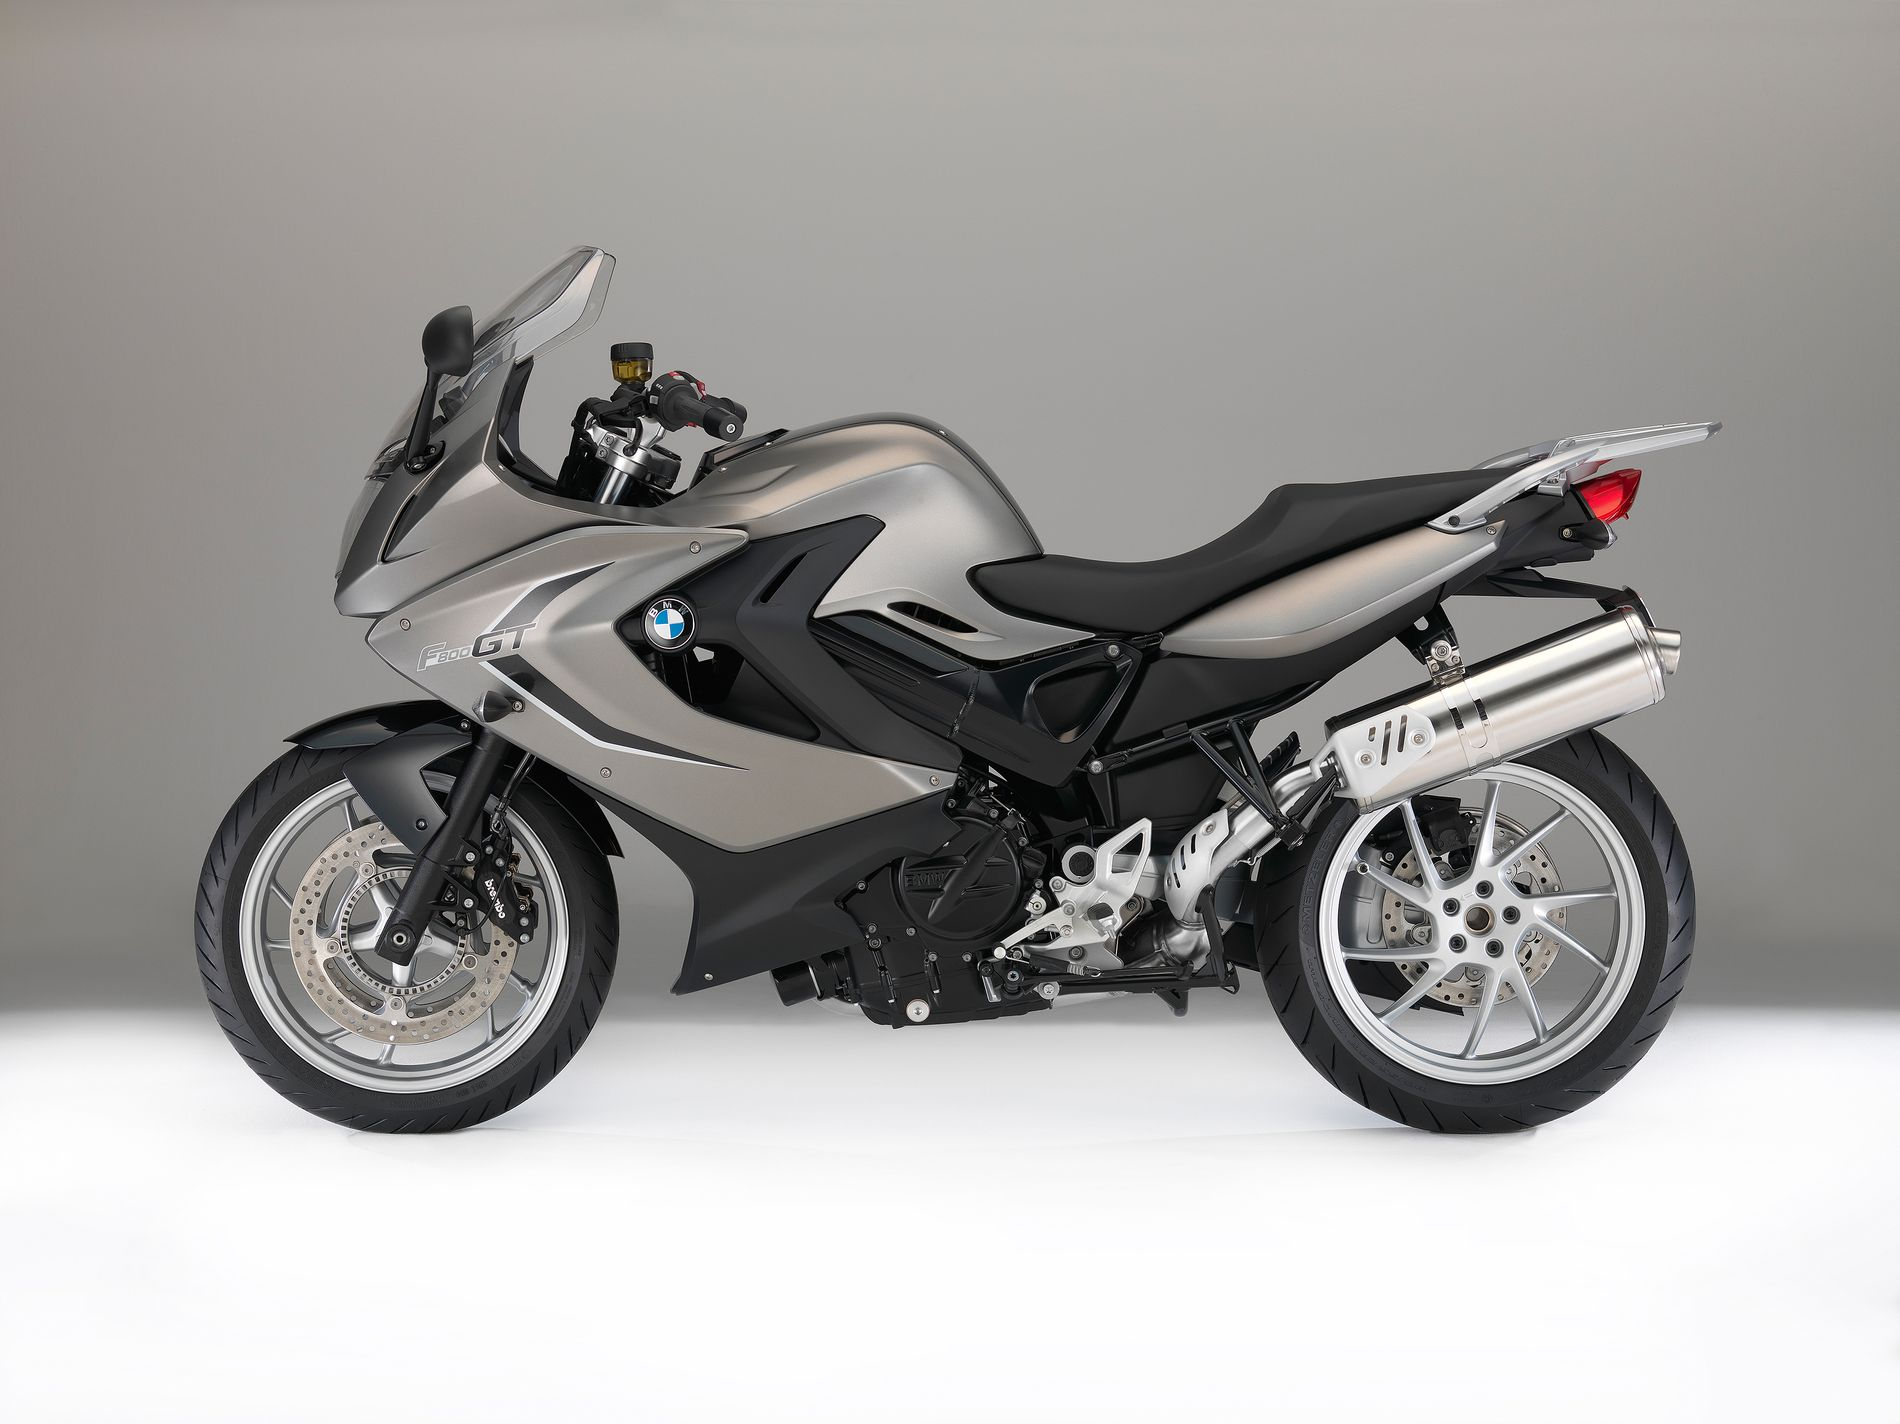 Des avis concernant les motos